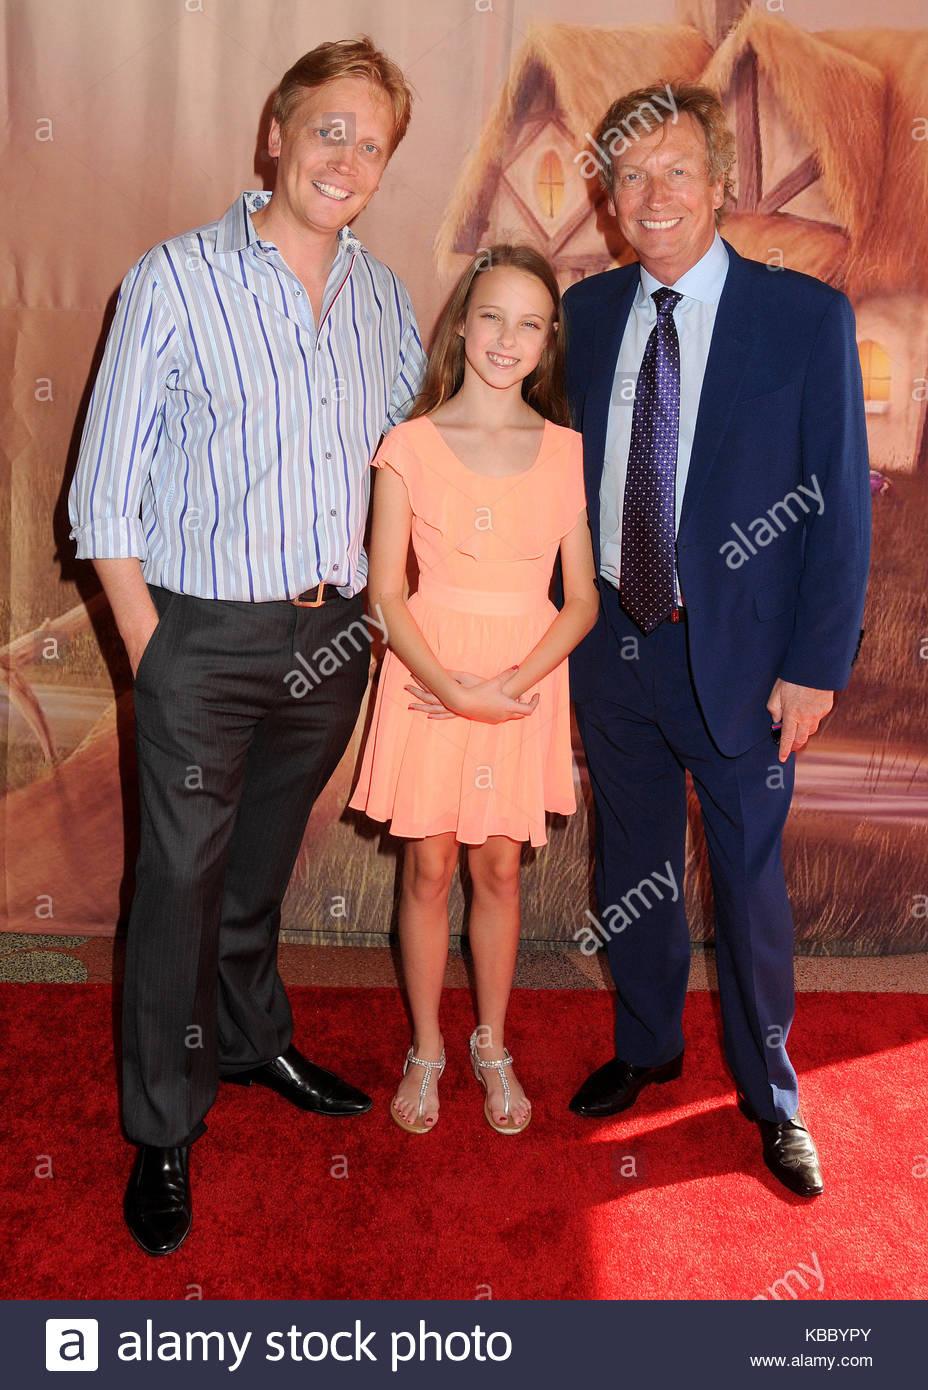 Simon Lythgoe, Dominique Lythgoe and Nigel Lythgoe. ADM_PRINCESSPIRATES_BP_26 - 18 July 2014 - Culver City, California - Stock Image